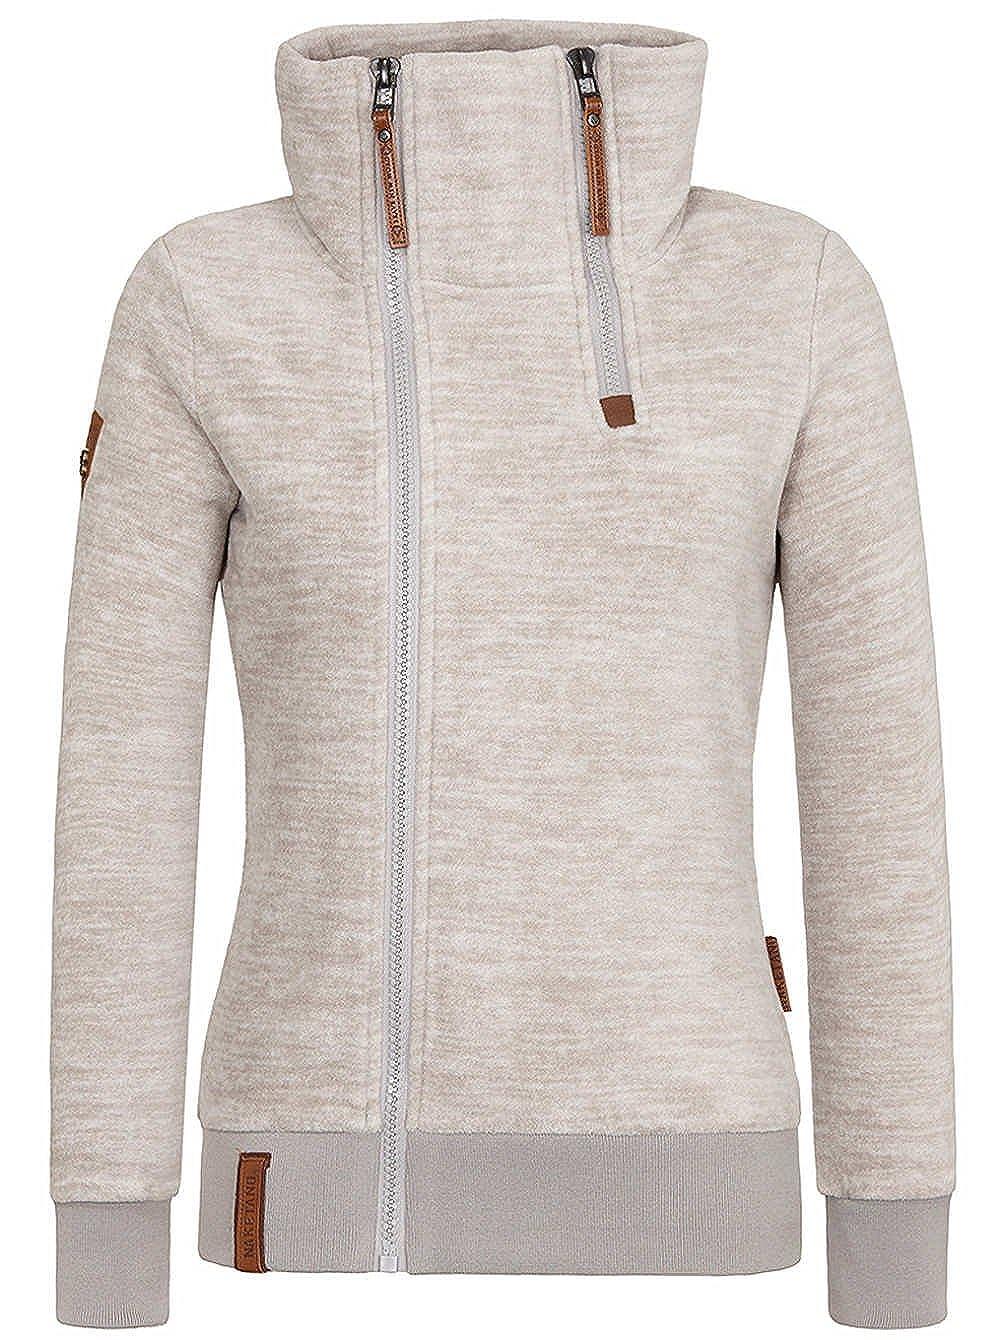 Naketano Women's Zipped Jacket Hamza Bau MA J iii